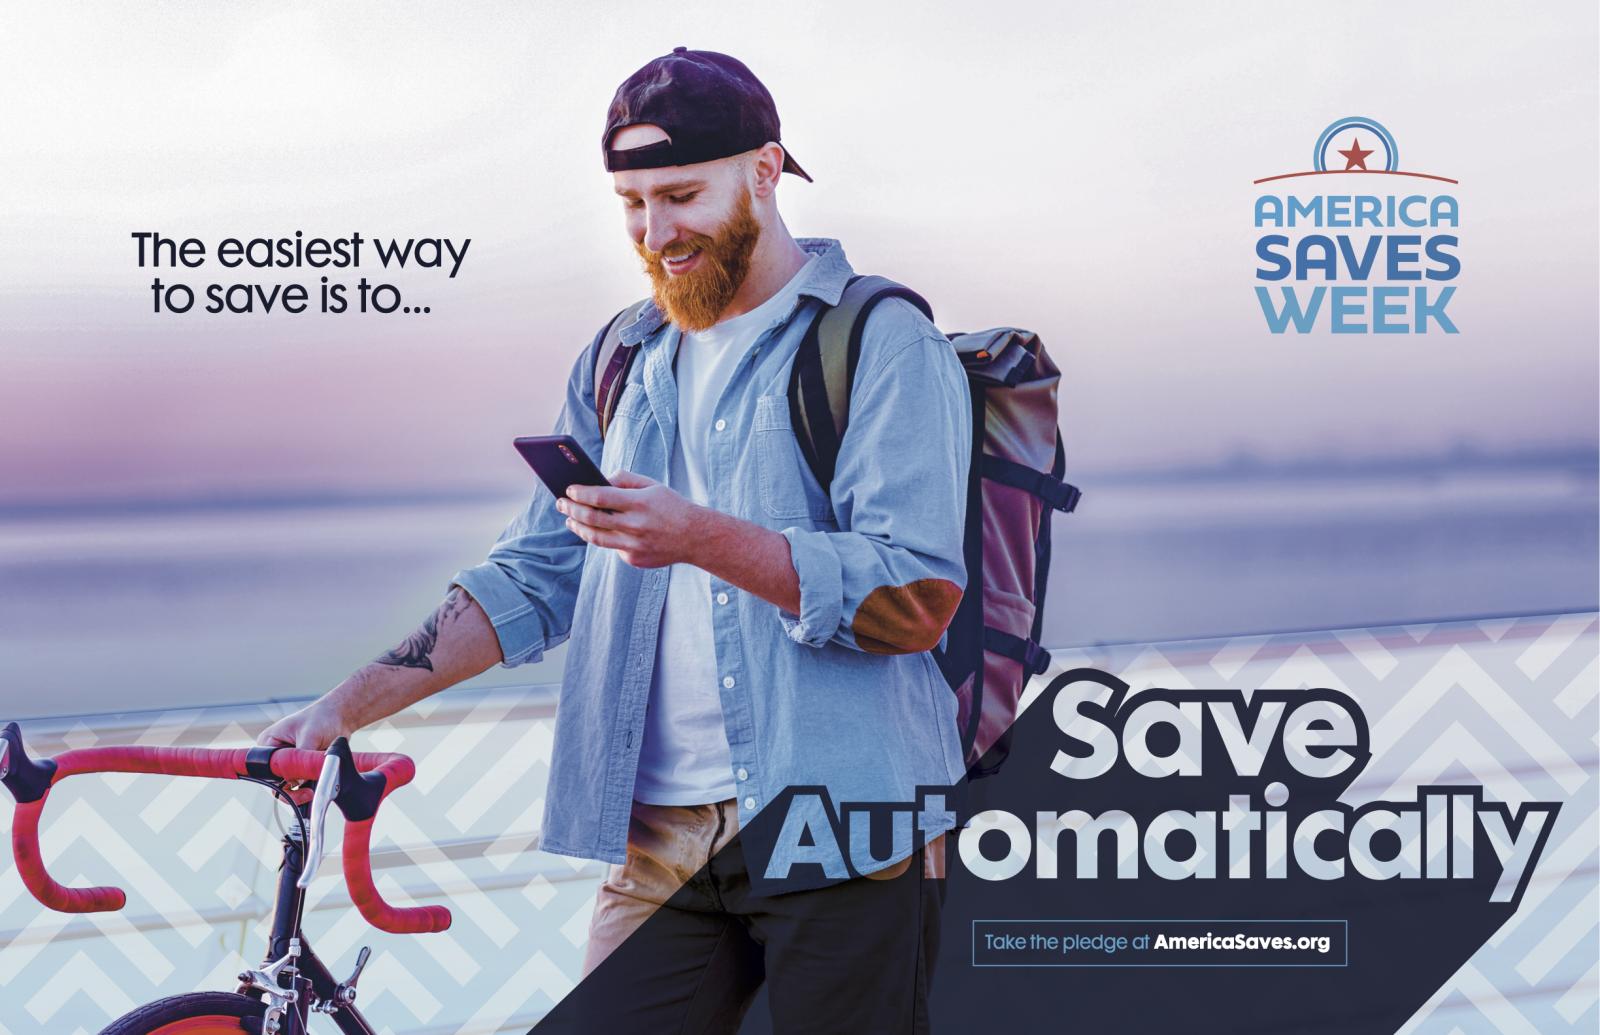 Save Automatically - America Saves Week 2021